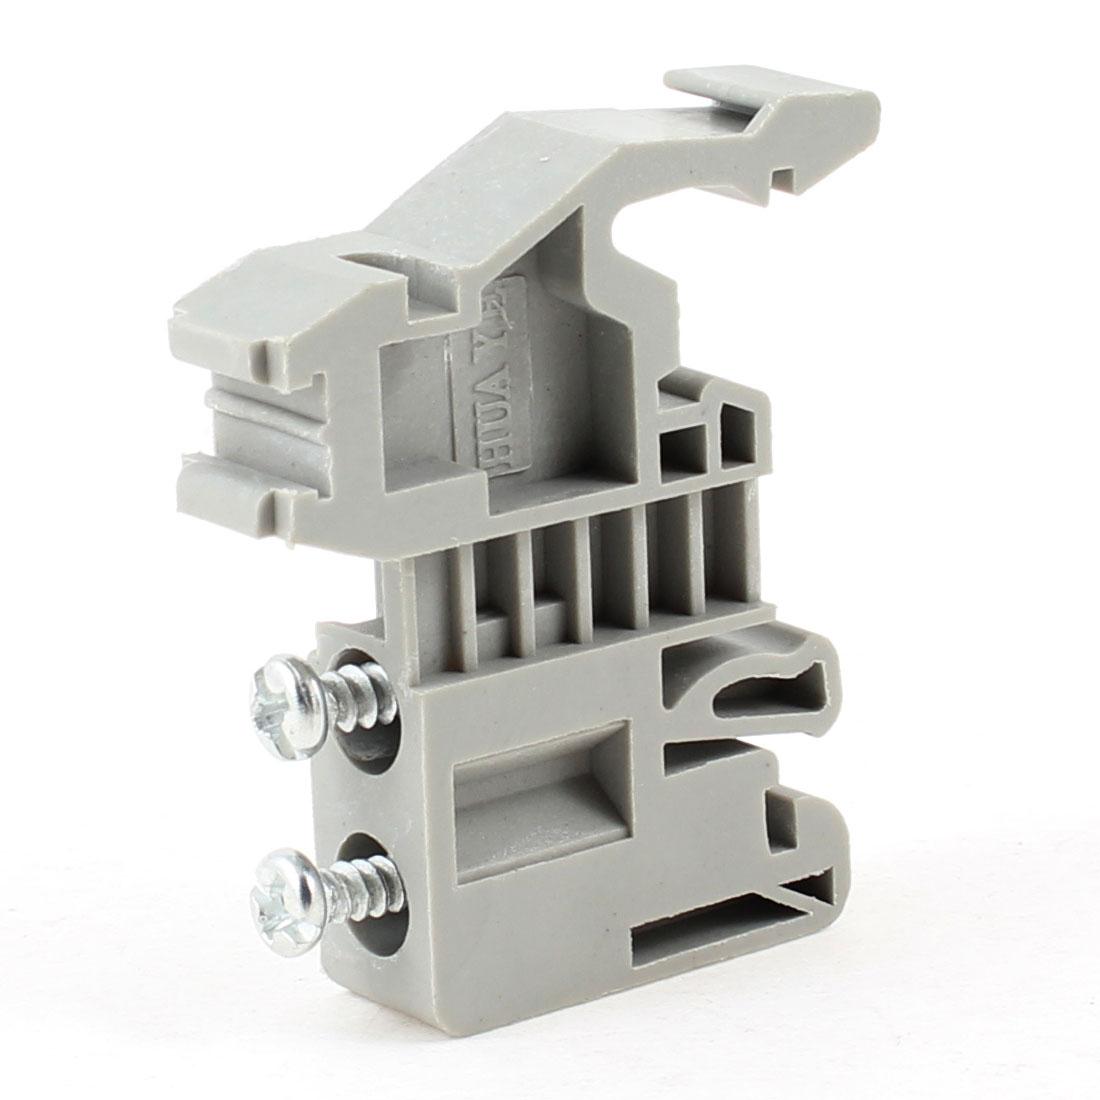 Gray 500V 17.5A IEC947-1 1.5mm2 Screw Clamp Terminal Block UK-1.5N